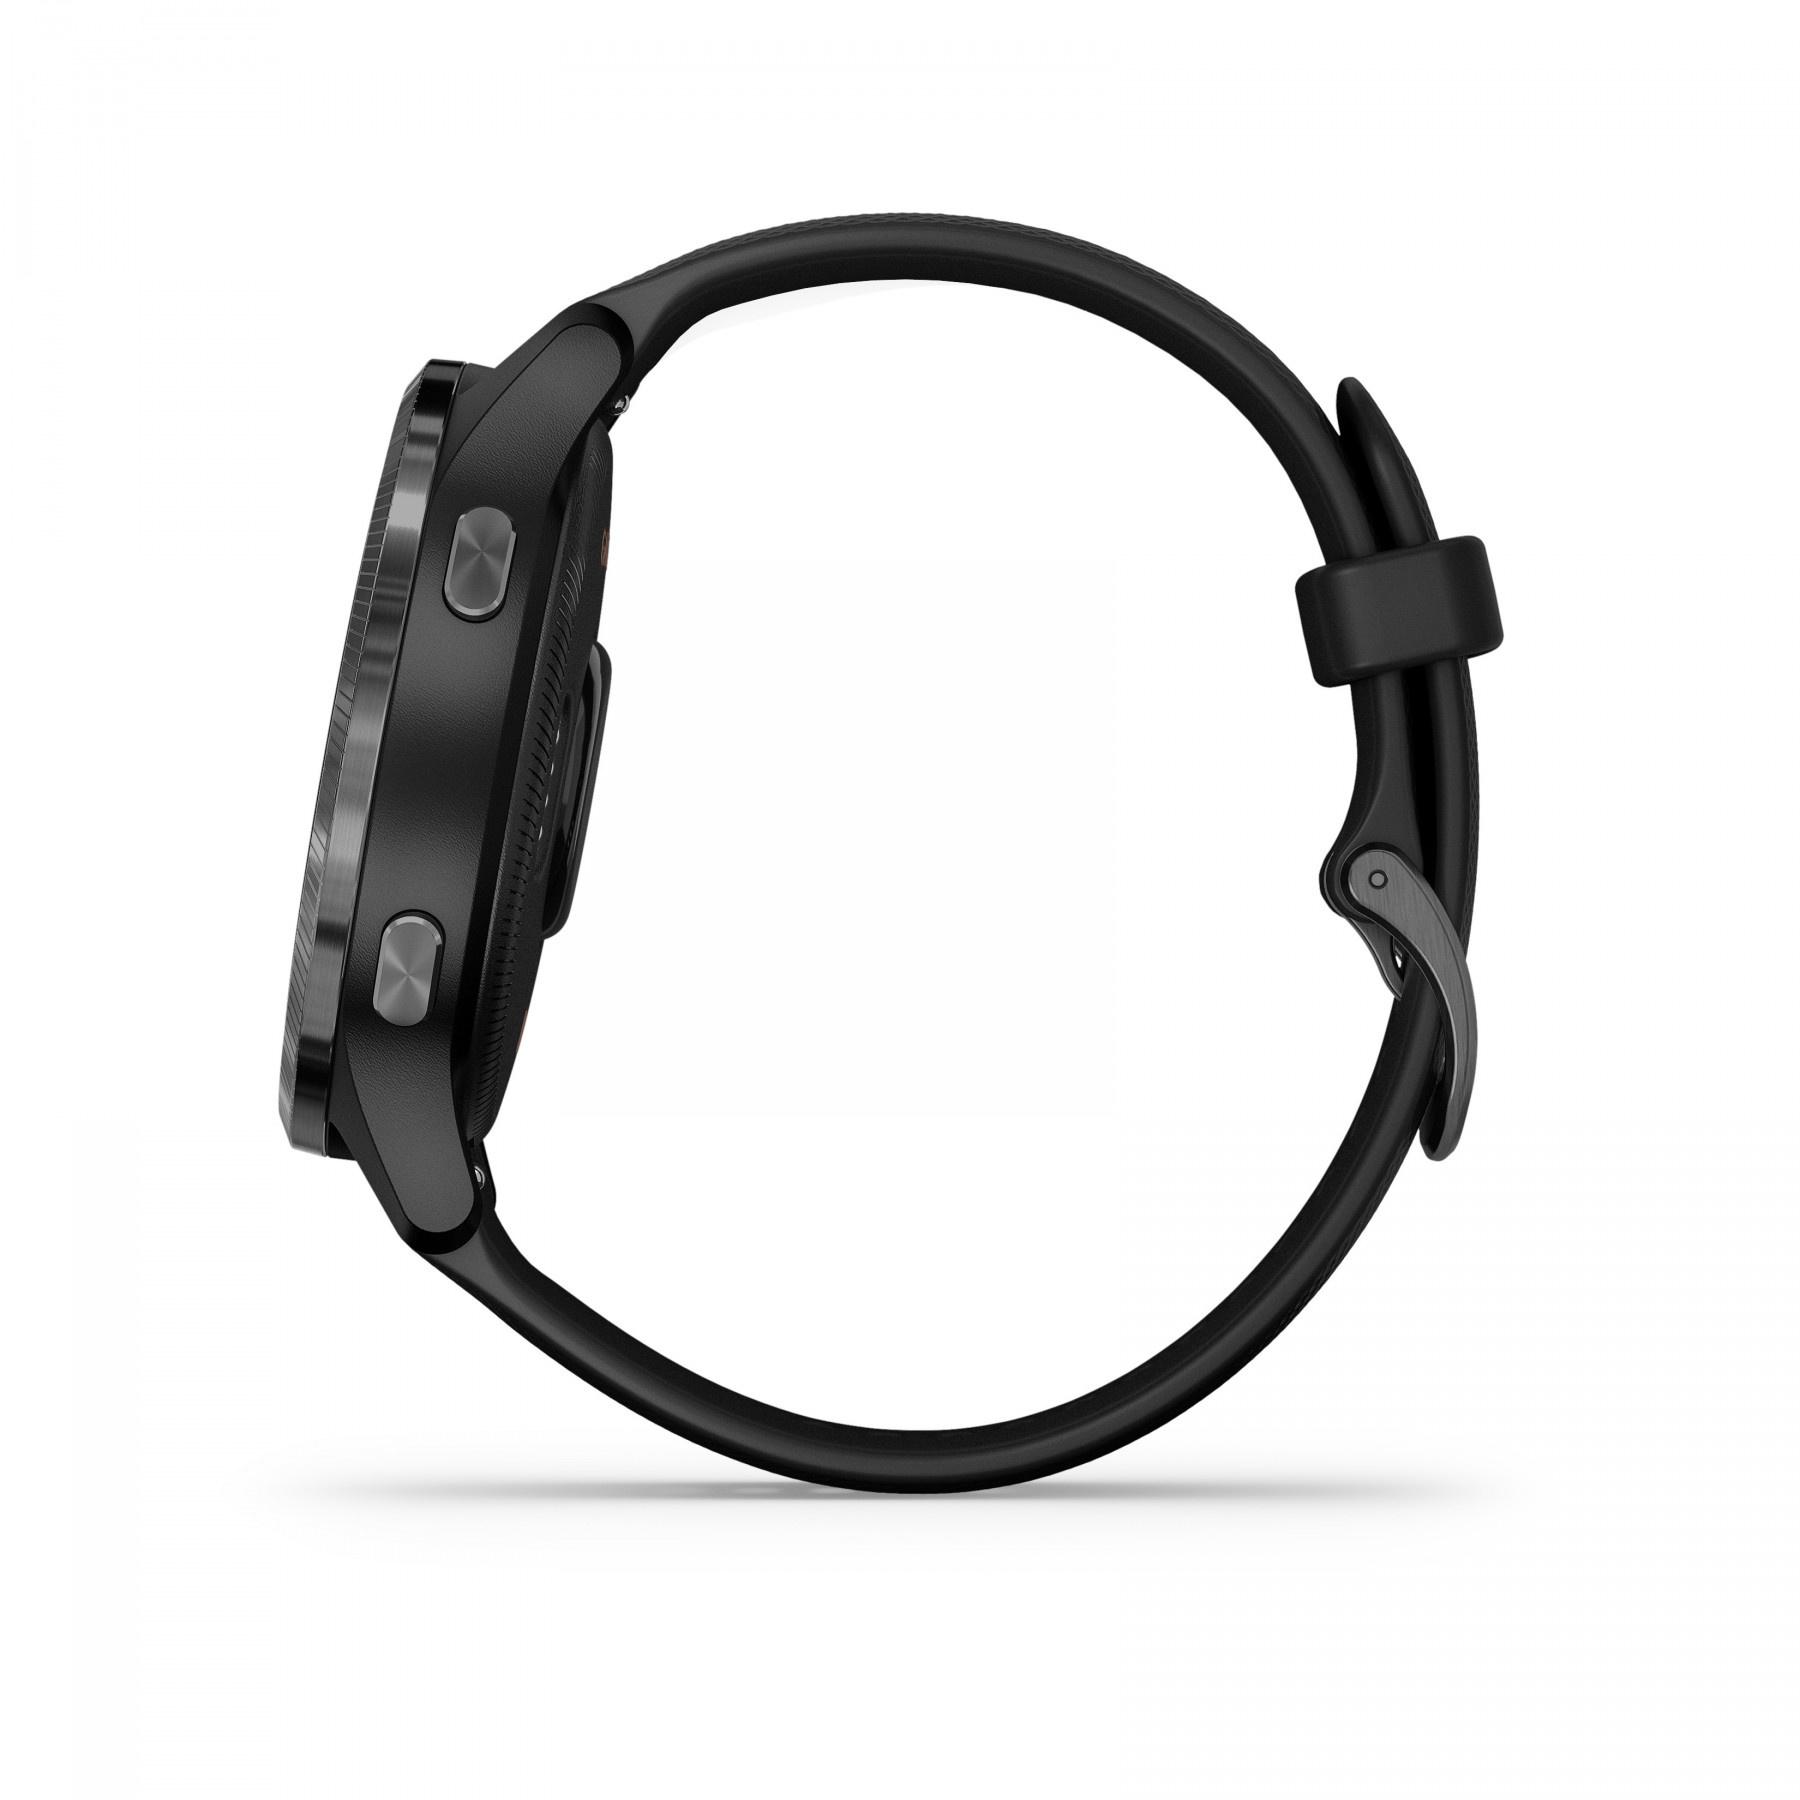 Garmin - Horloge Sport - Venu - Black met Slategrey-3